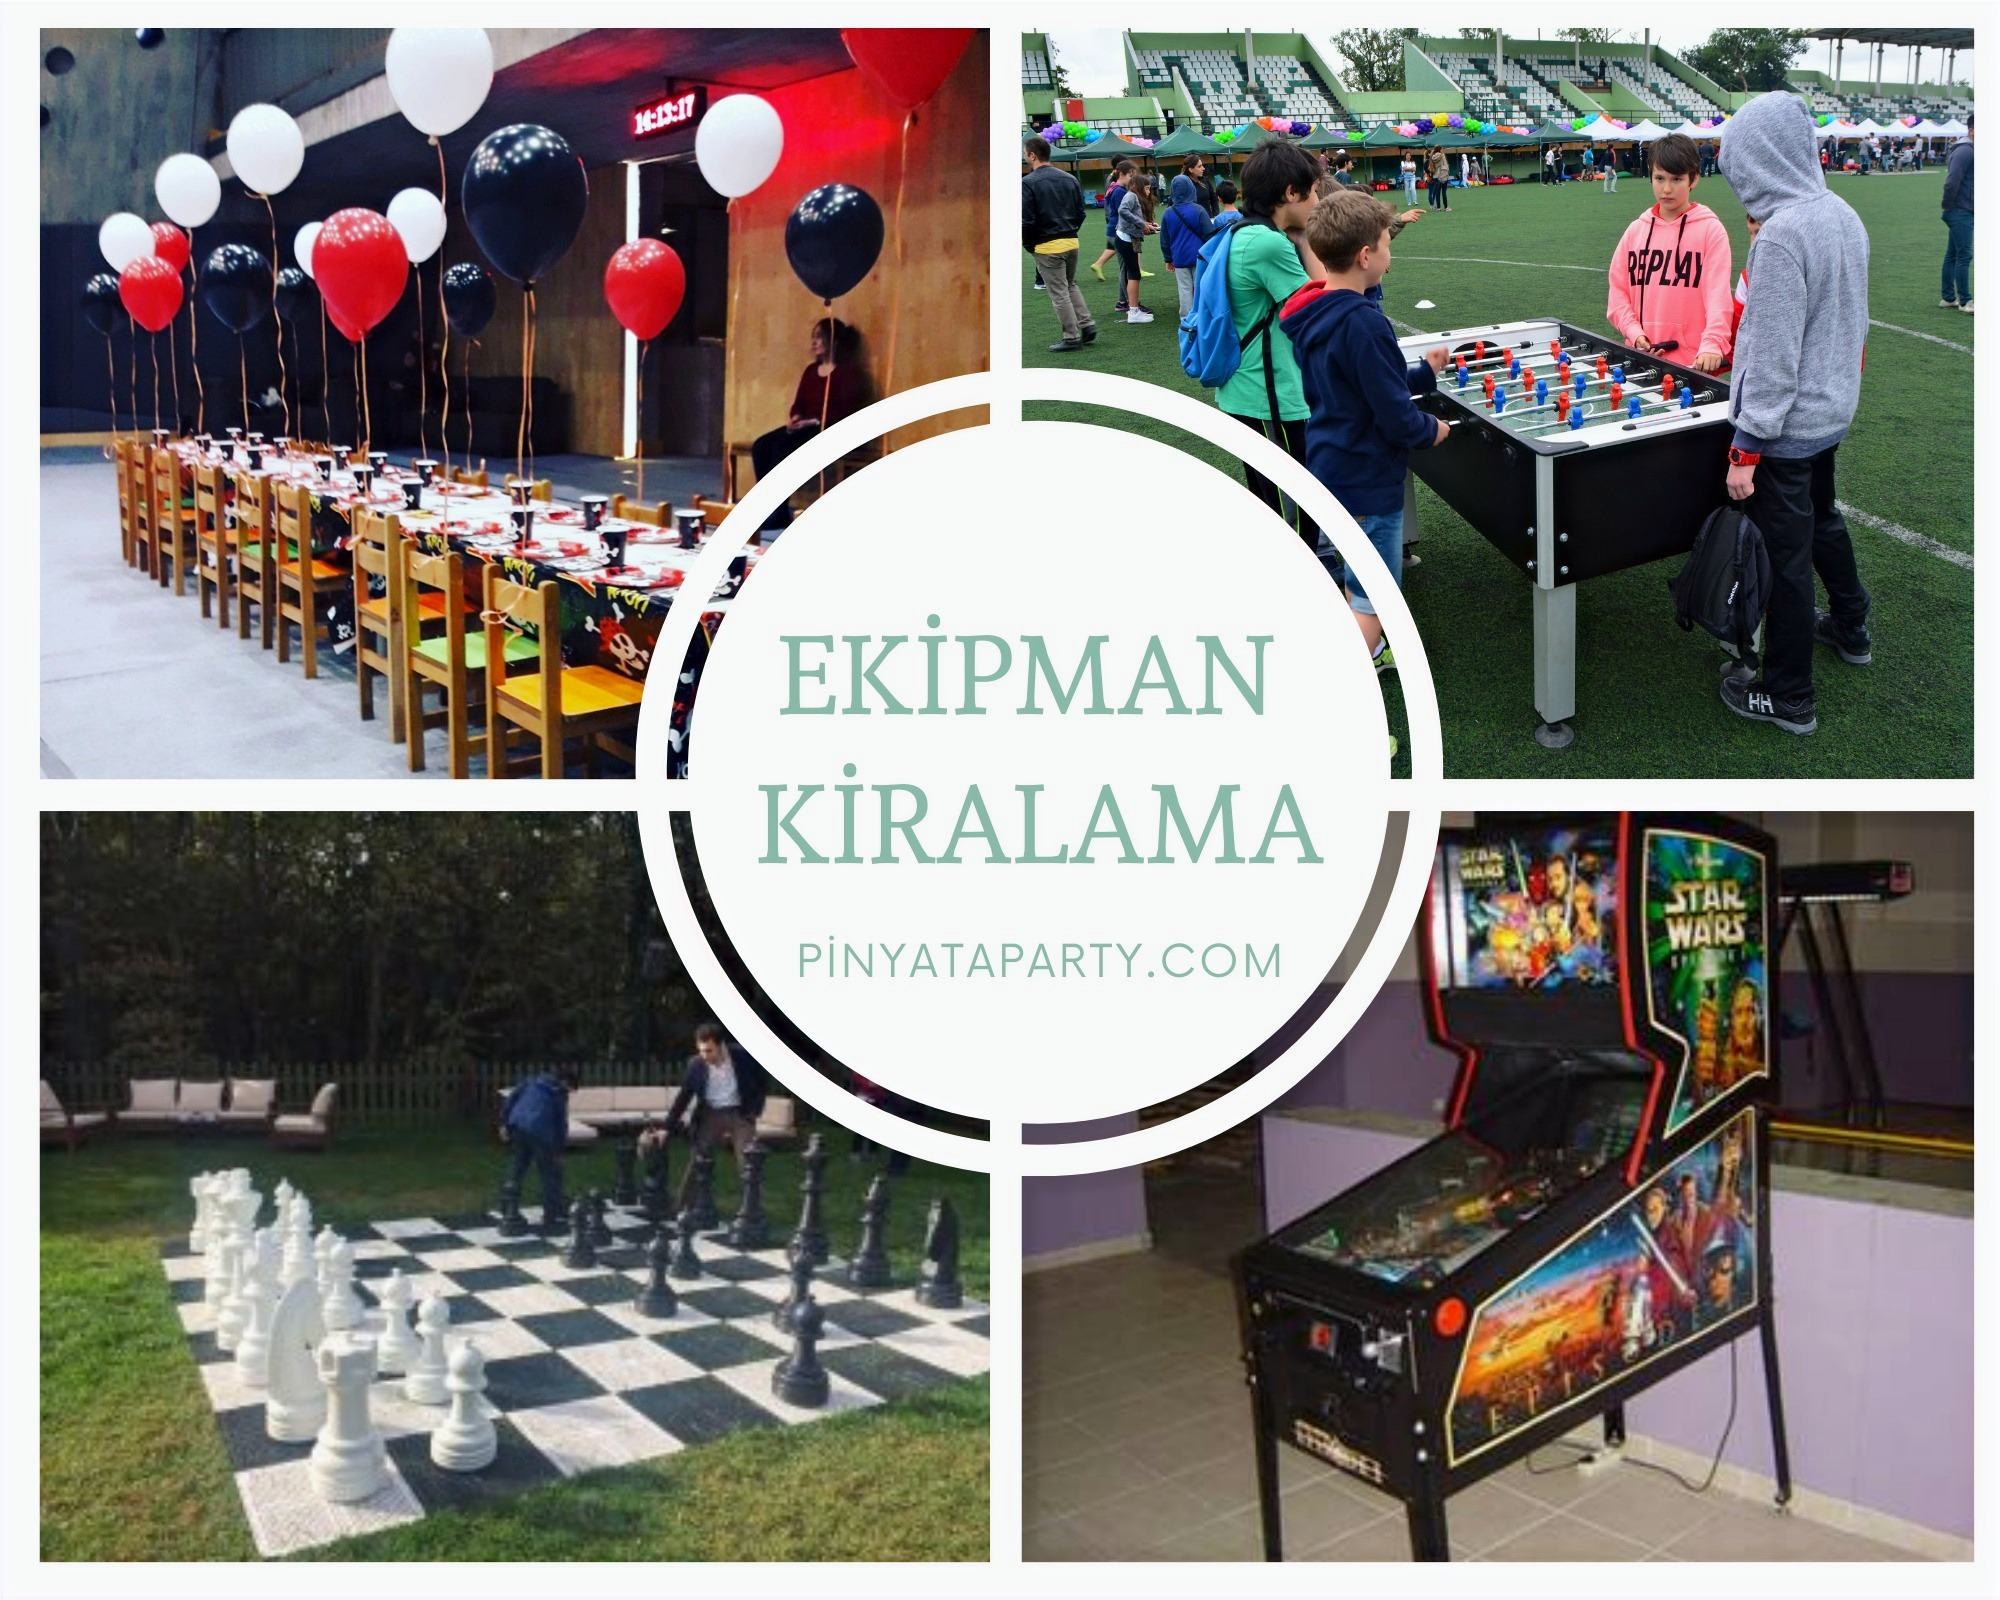 Ekipman-Kiralama-Hizmetleri_edited